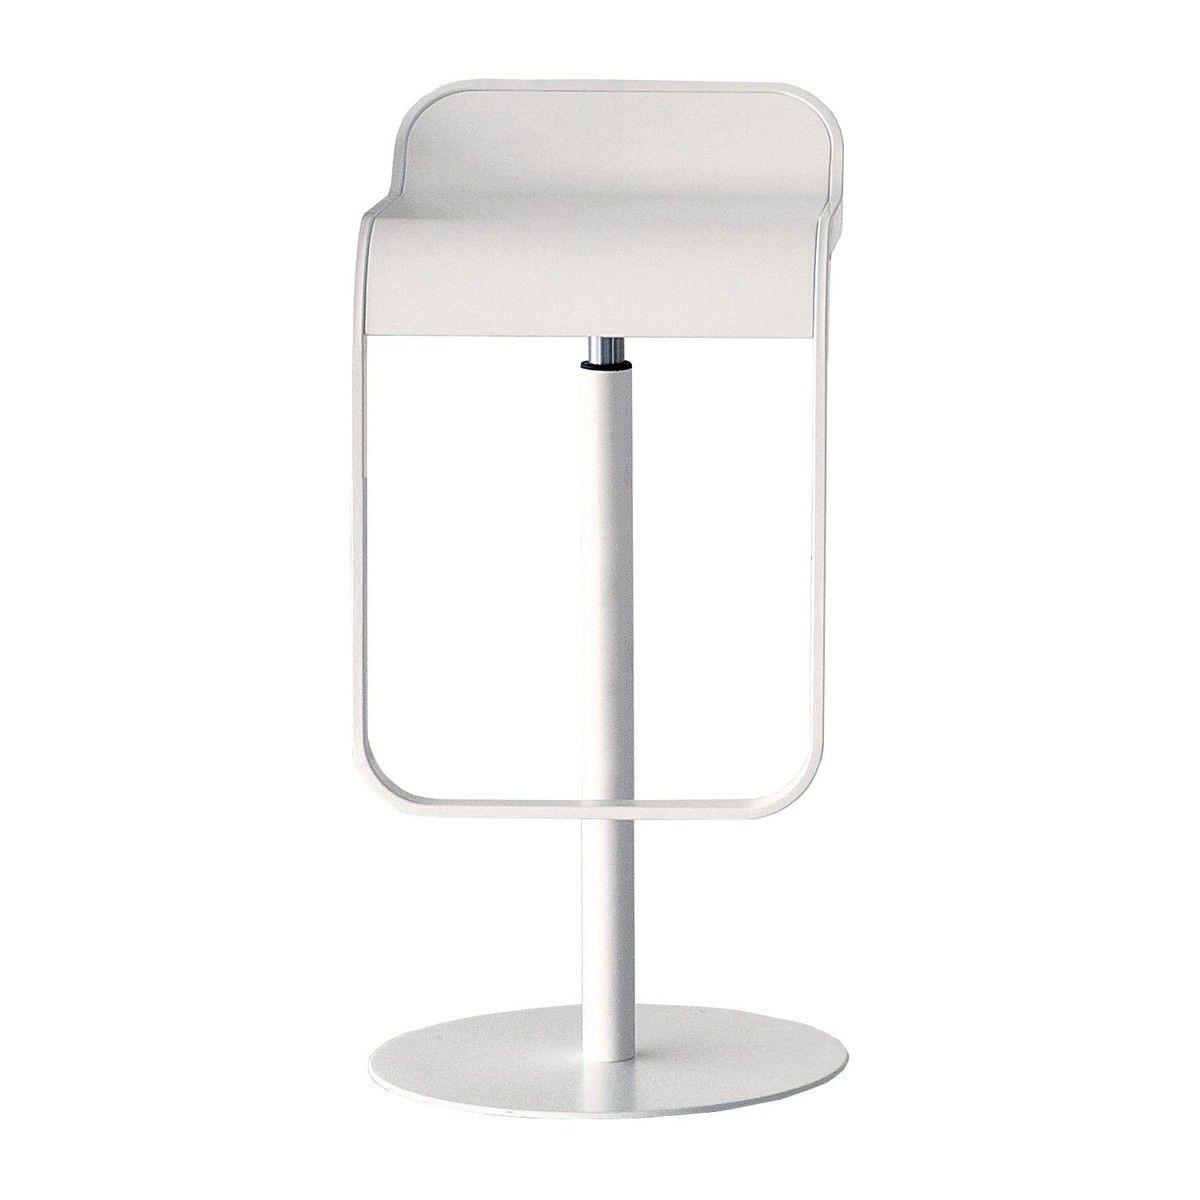 lem 66-79 bar stool frame white | la palma | ambientedirect, Moderne